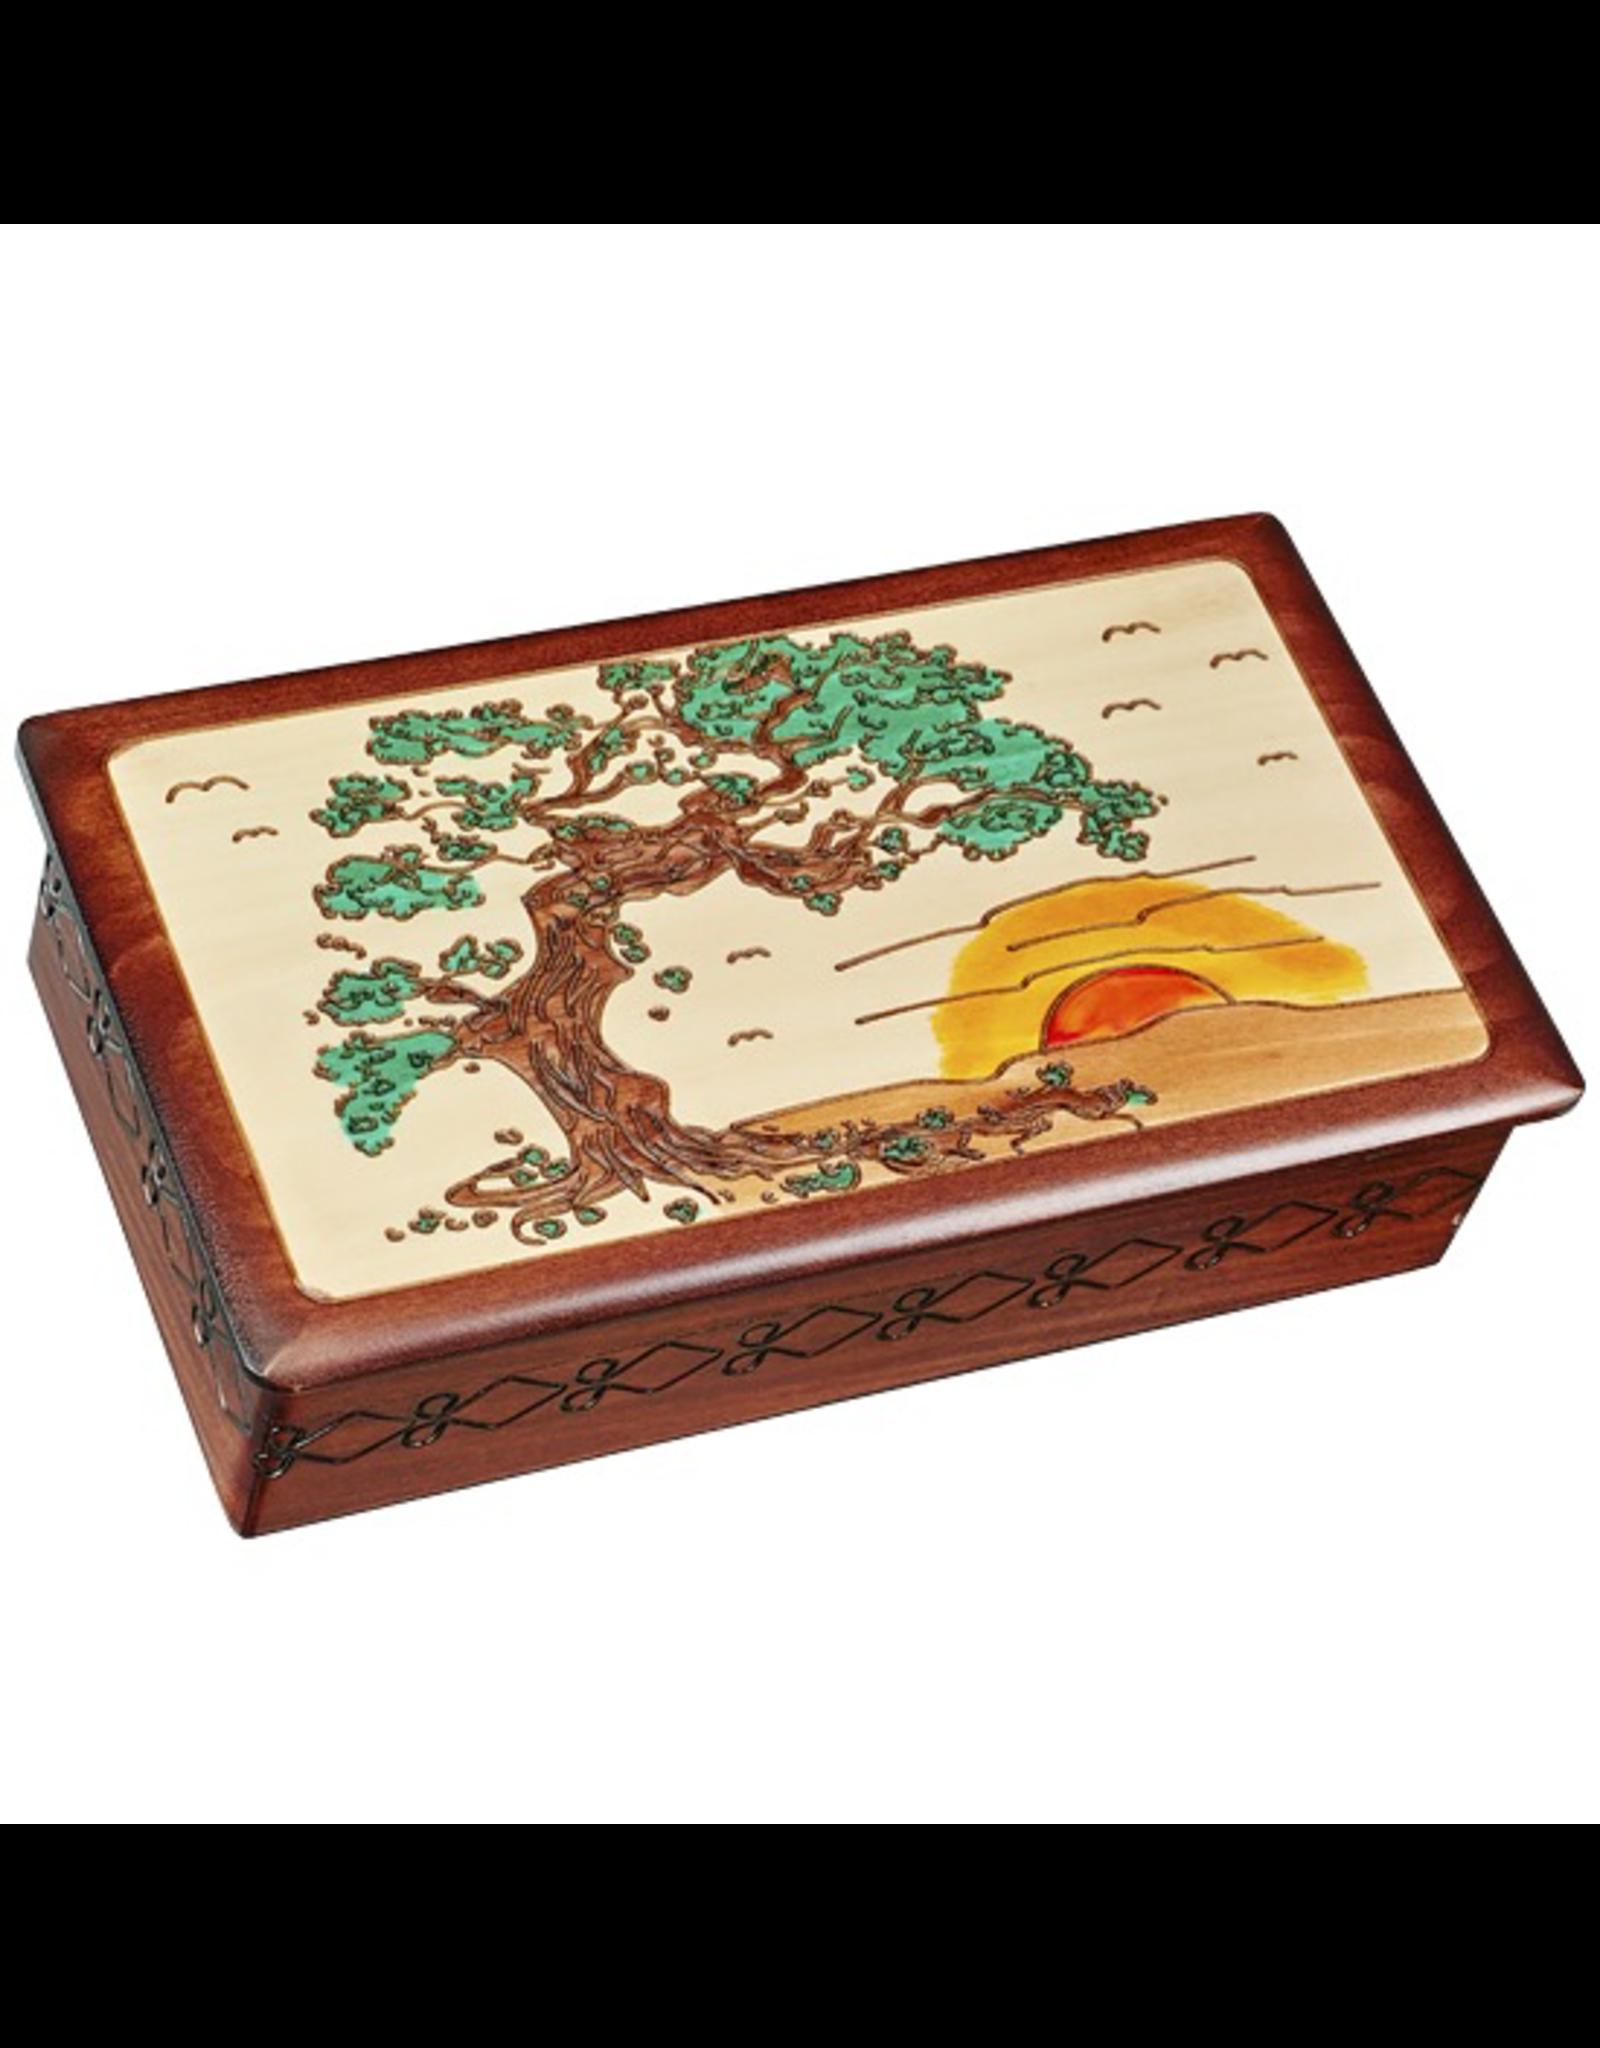 Enchanted Boxes Sunset Japanese Bonsai Wood Box